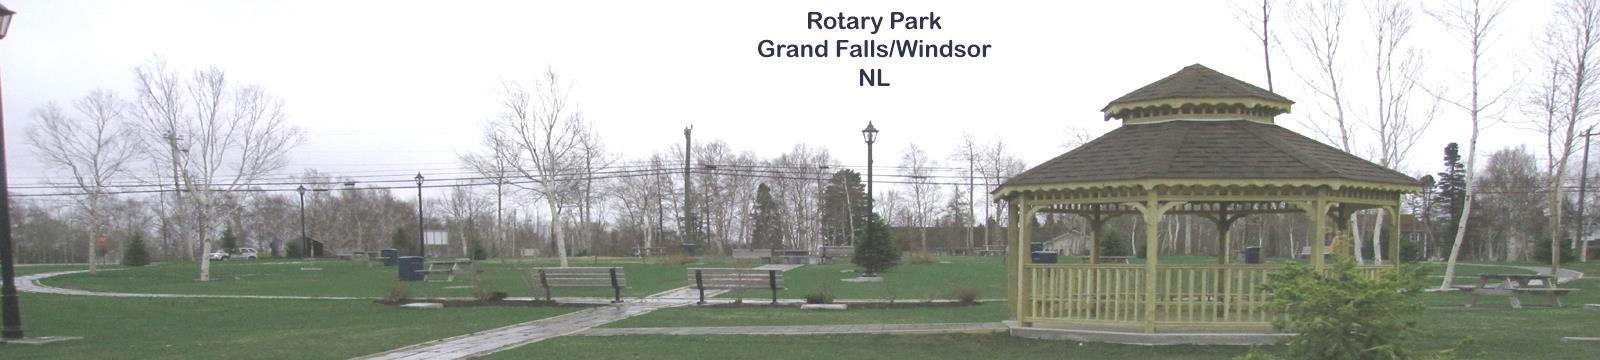 Grand Falls NL